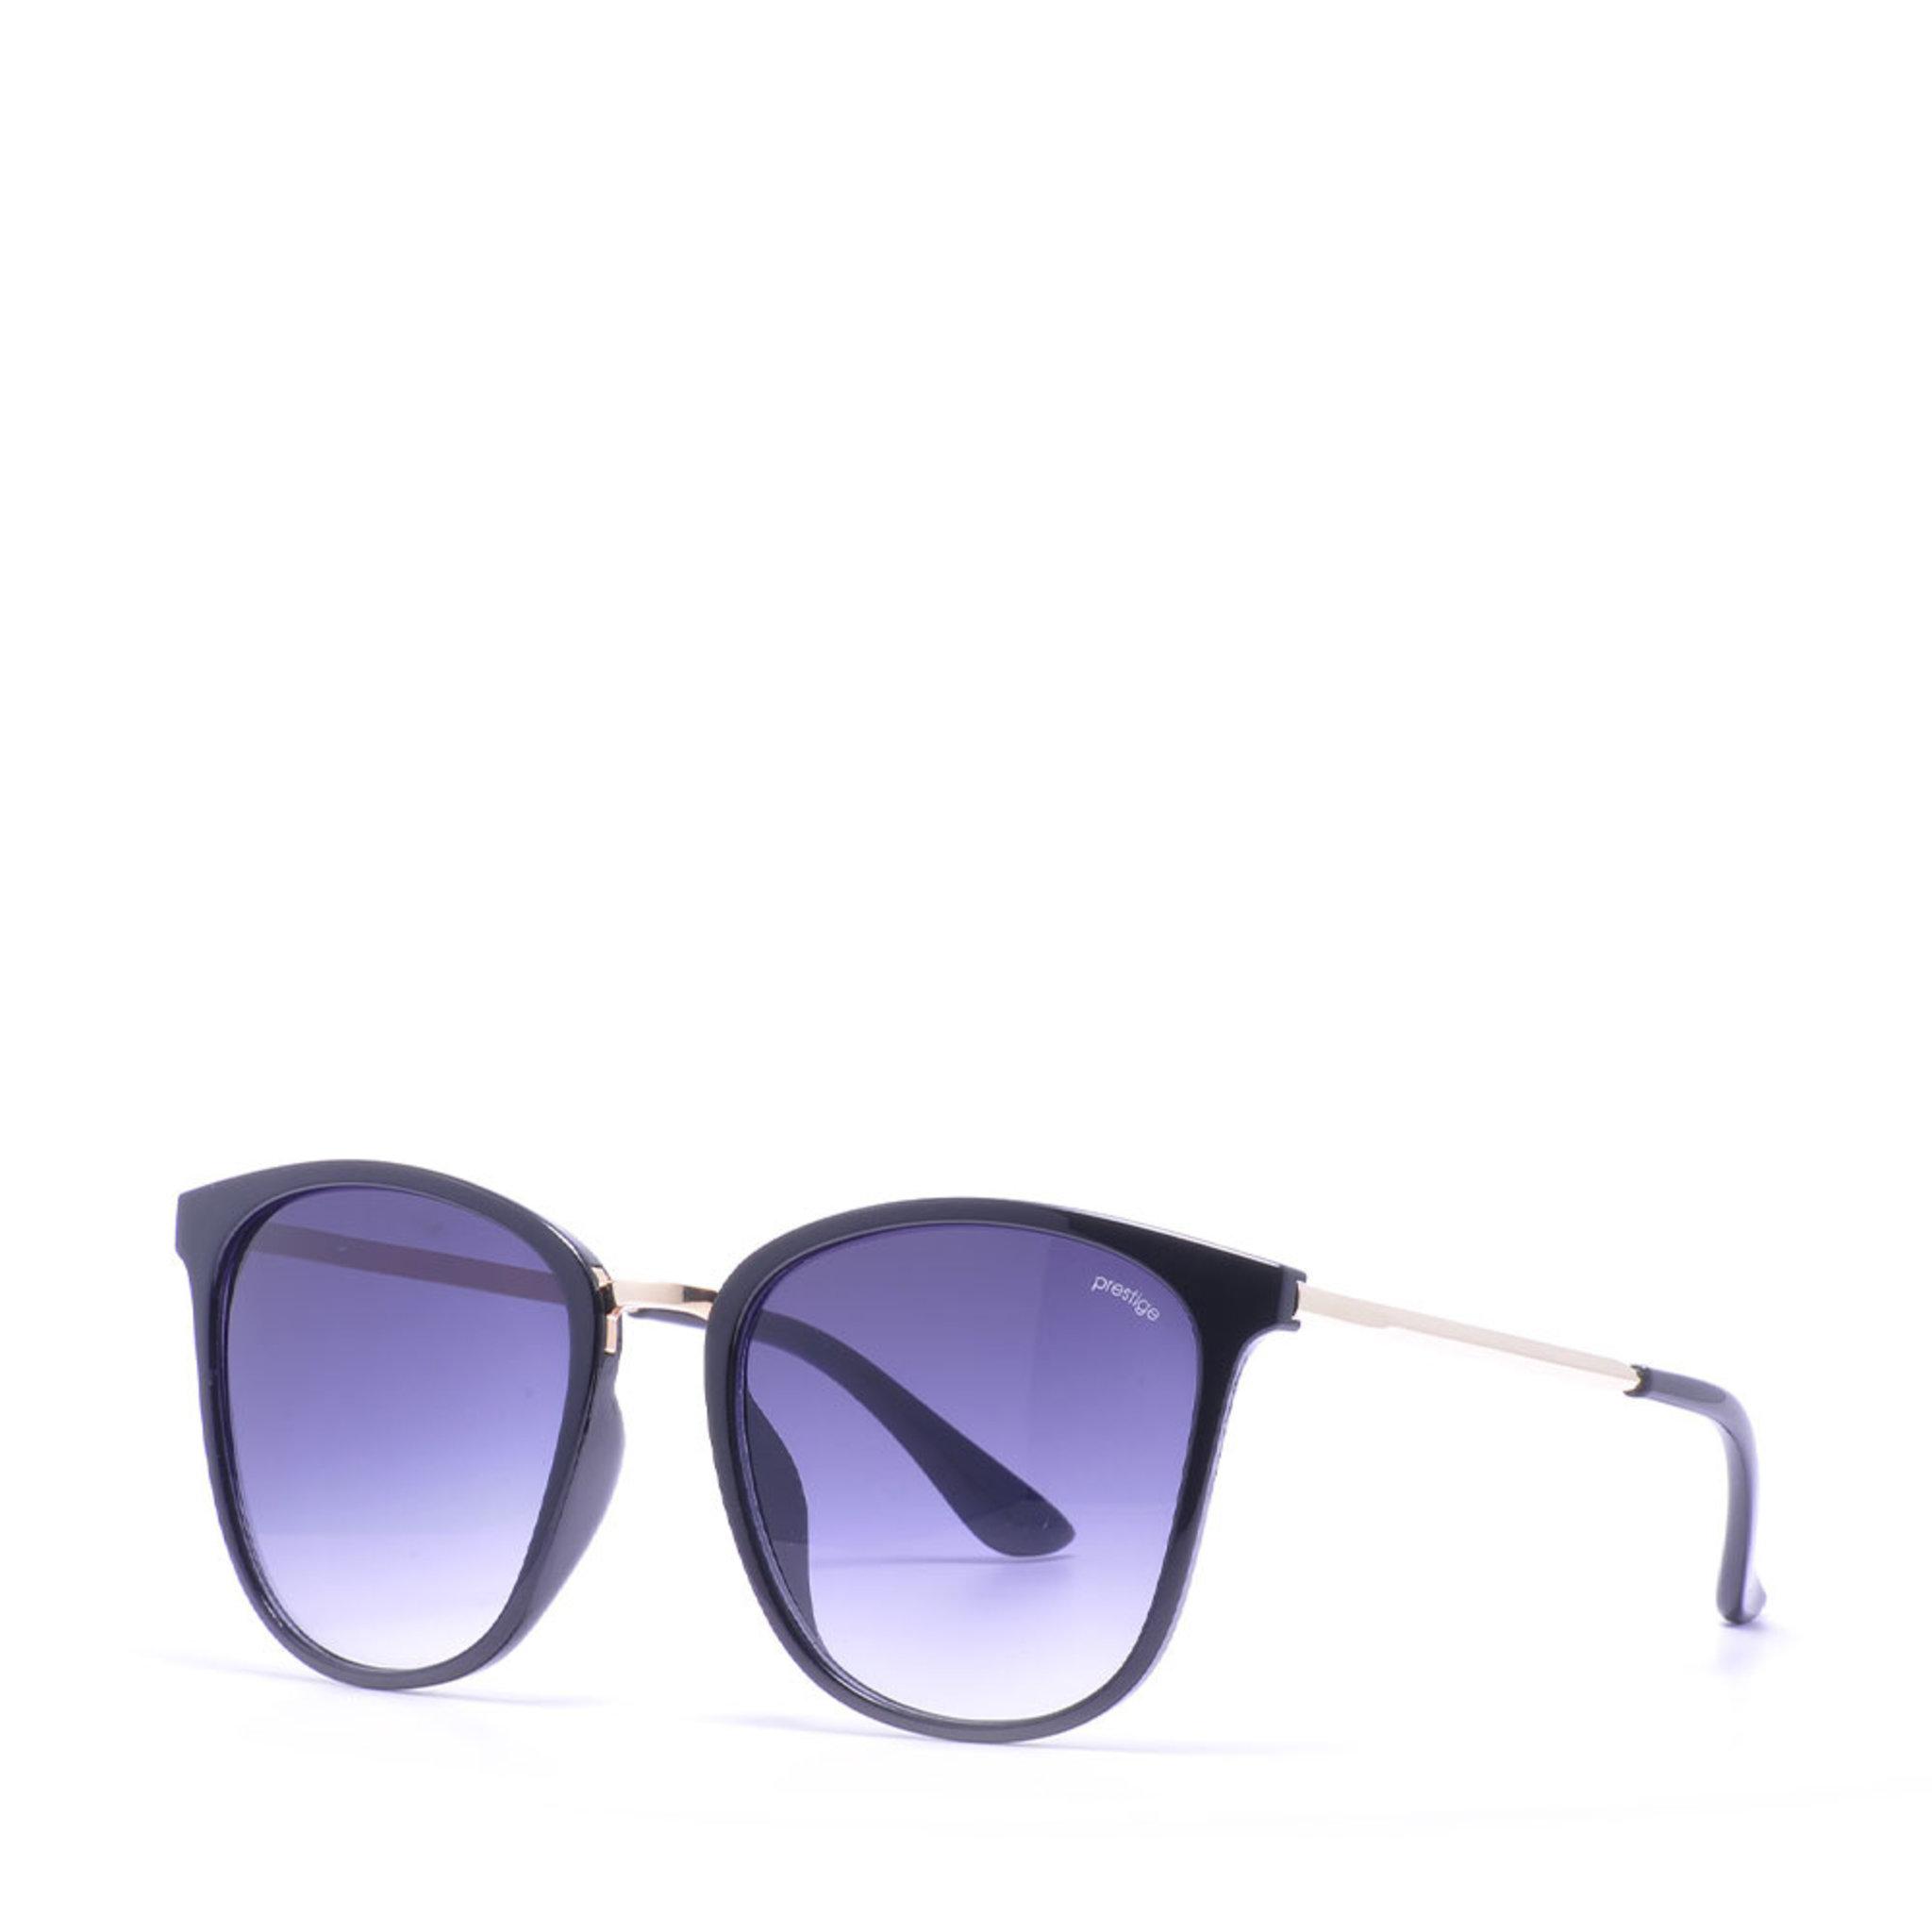 Amanda Black Sunglasses